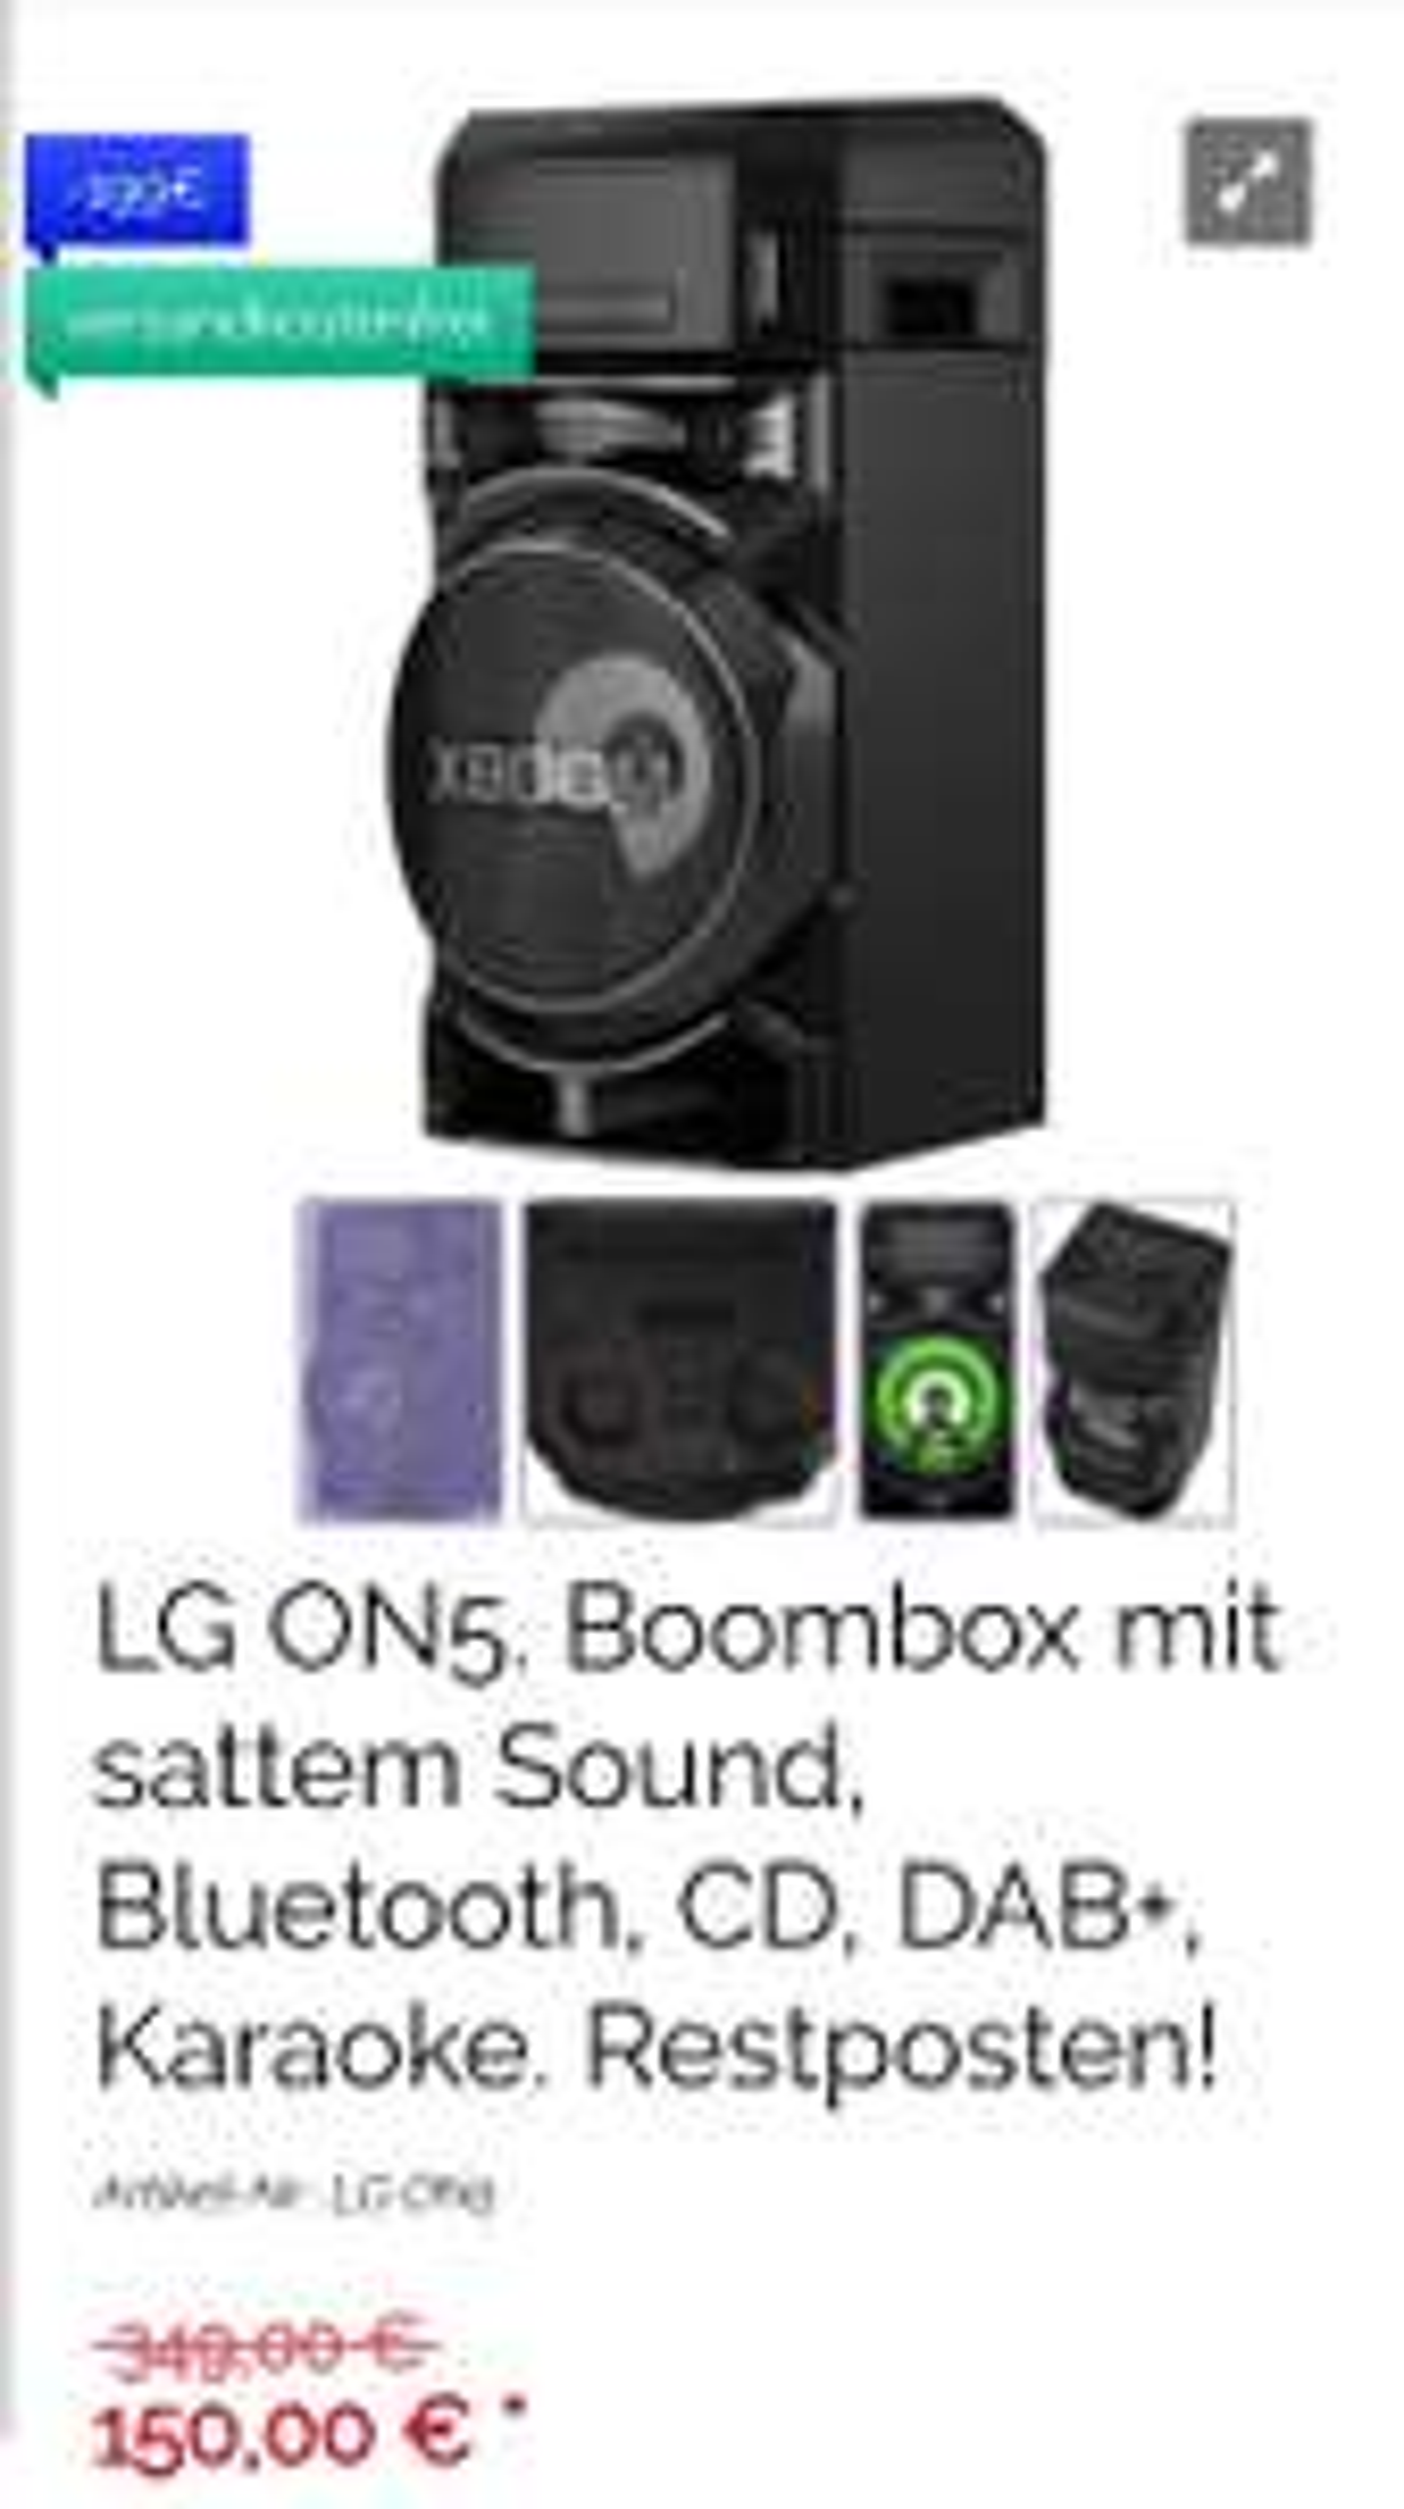 LG ON5. Boombox mit sattem Sound, Bluetooth, CD, DAB+, Karaoke